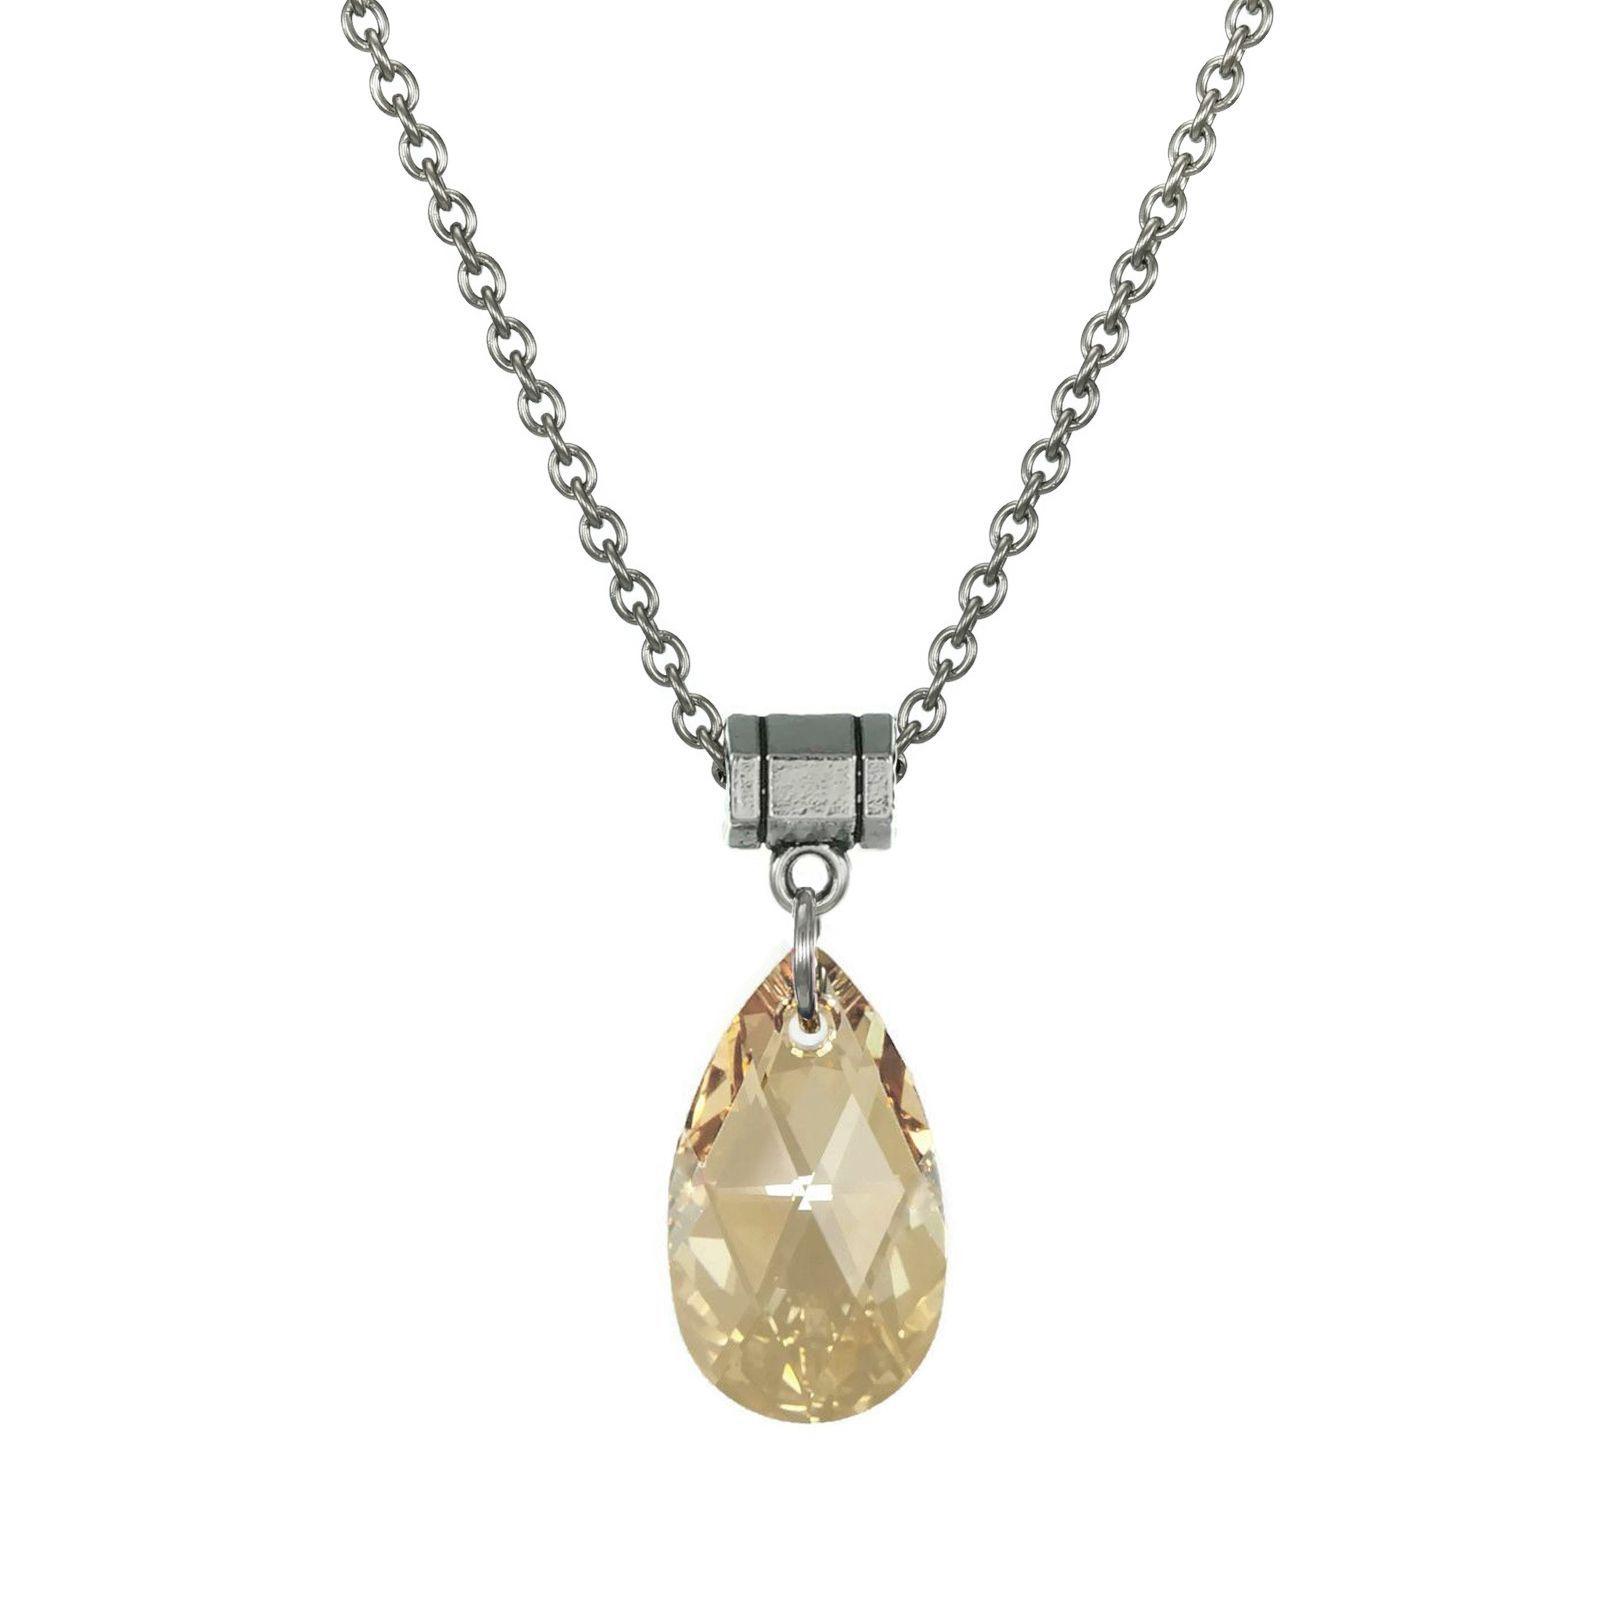 Jewelry by Dawn en Shadow Crystal Teardrop Pear Stainless Steel Chain Necklace